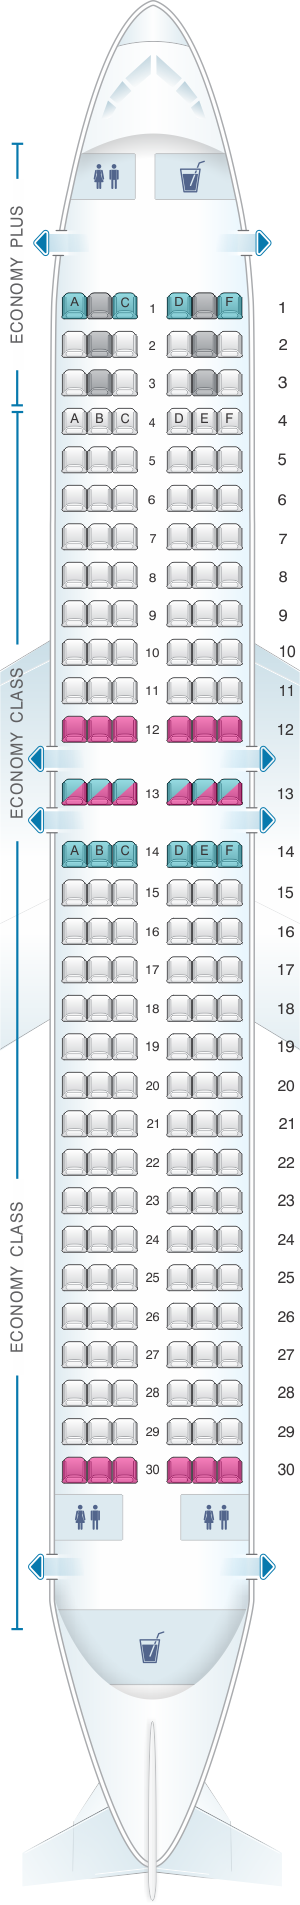 Seat map for WestJet Boeing B737 MAX 8